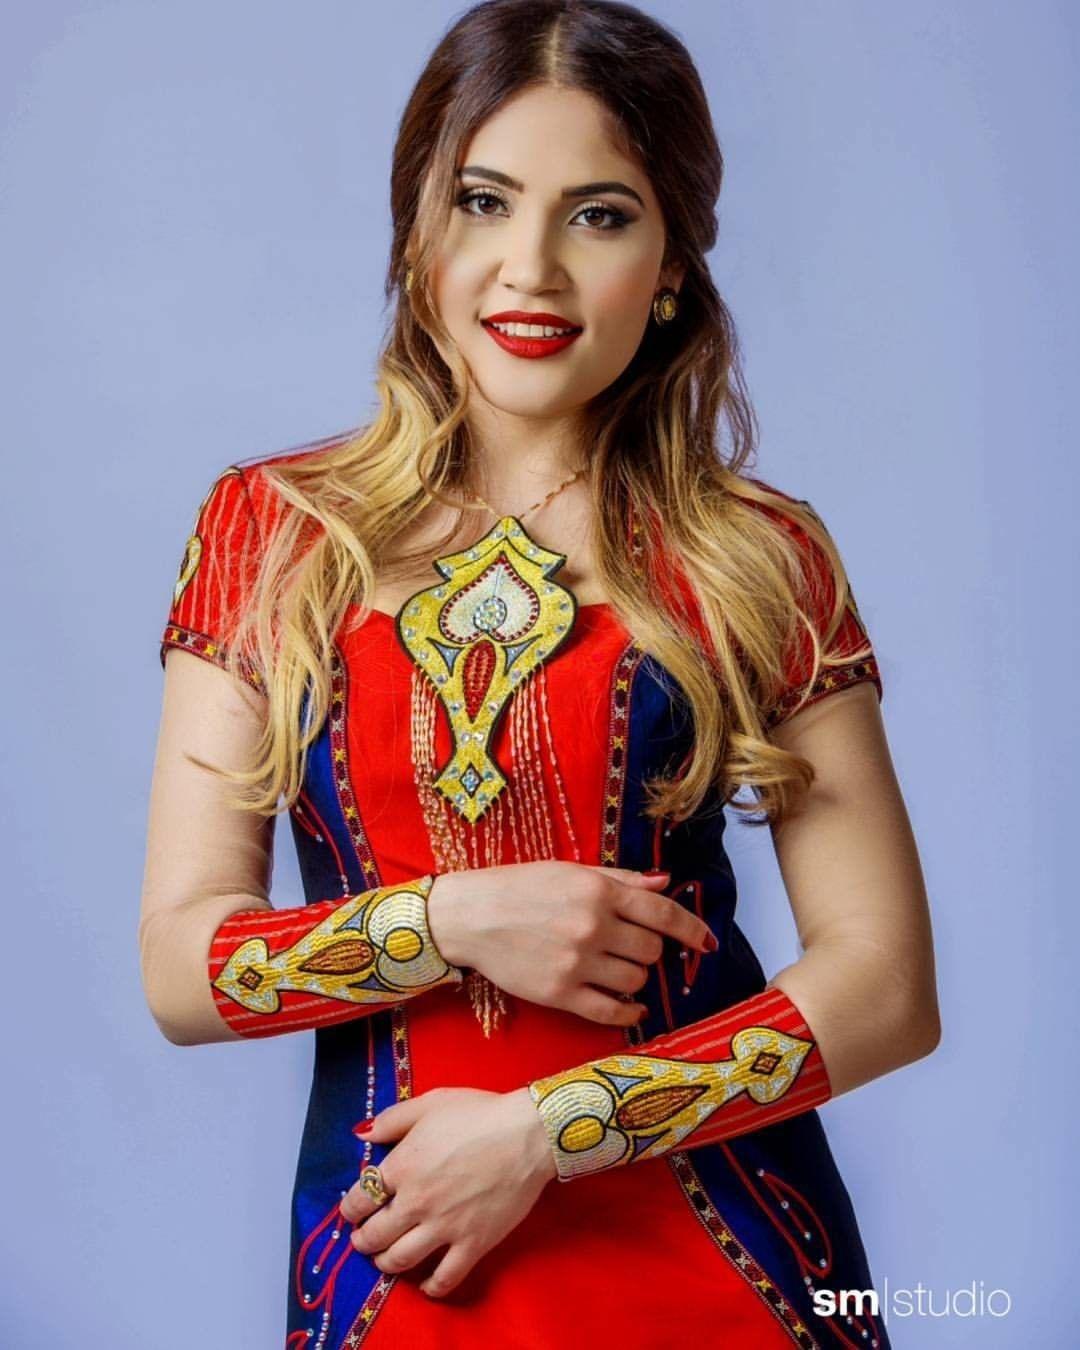 Adeyyo Abadan Halmedova Fashion Saree Sari